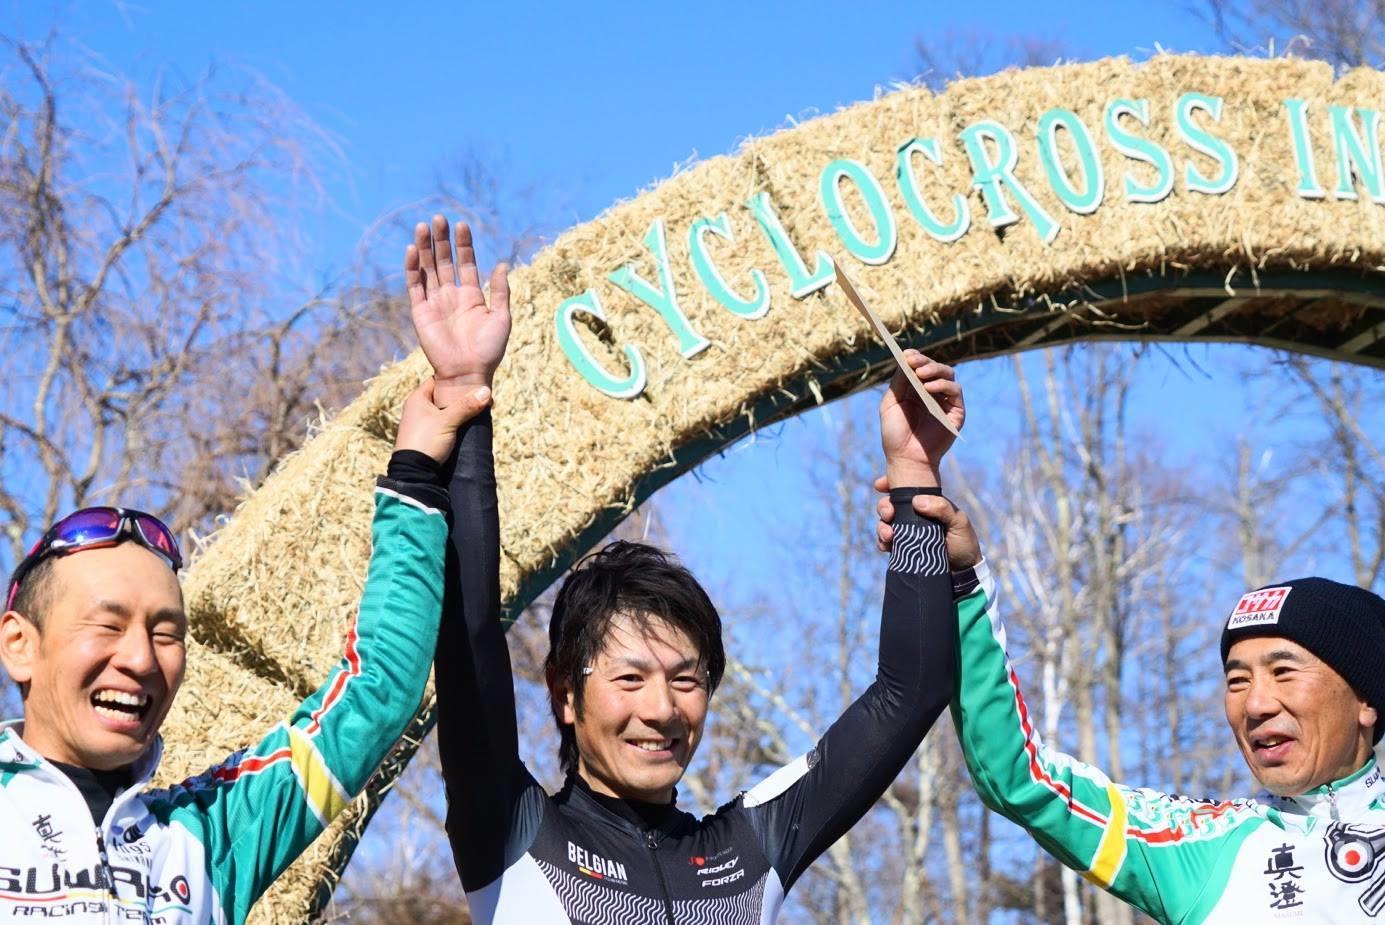 https://www.cyclocross.jp/news/50301904_2270421889881823_850100656399187968_o.jpg